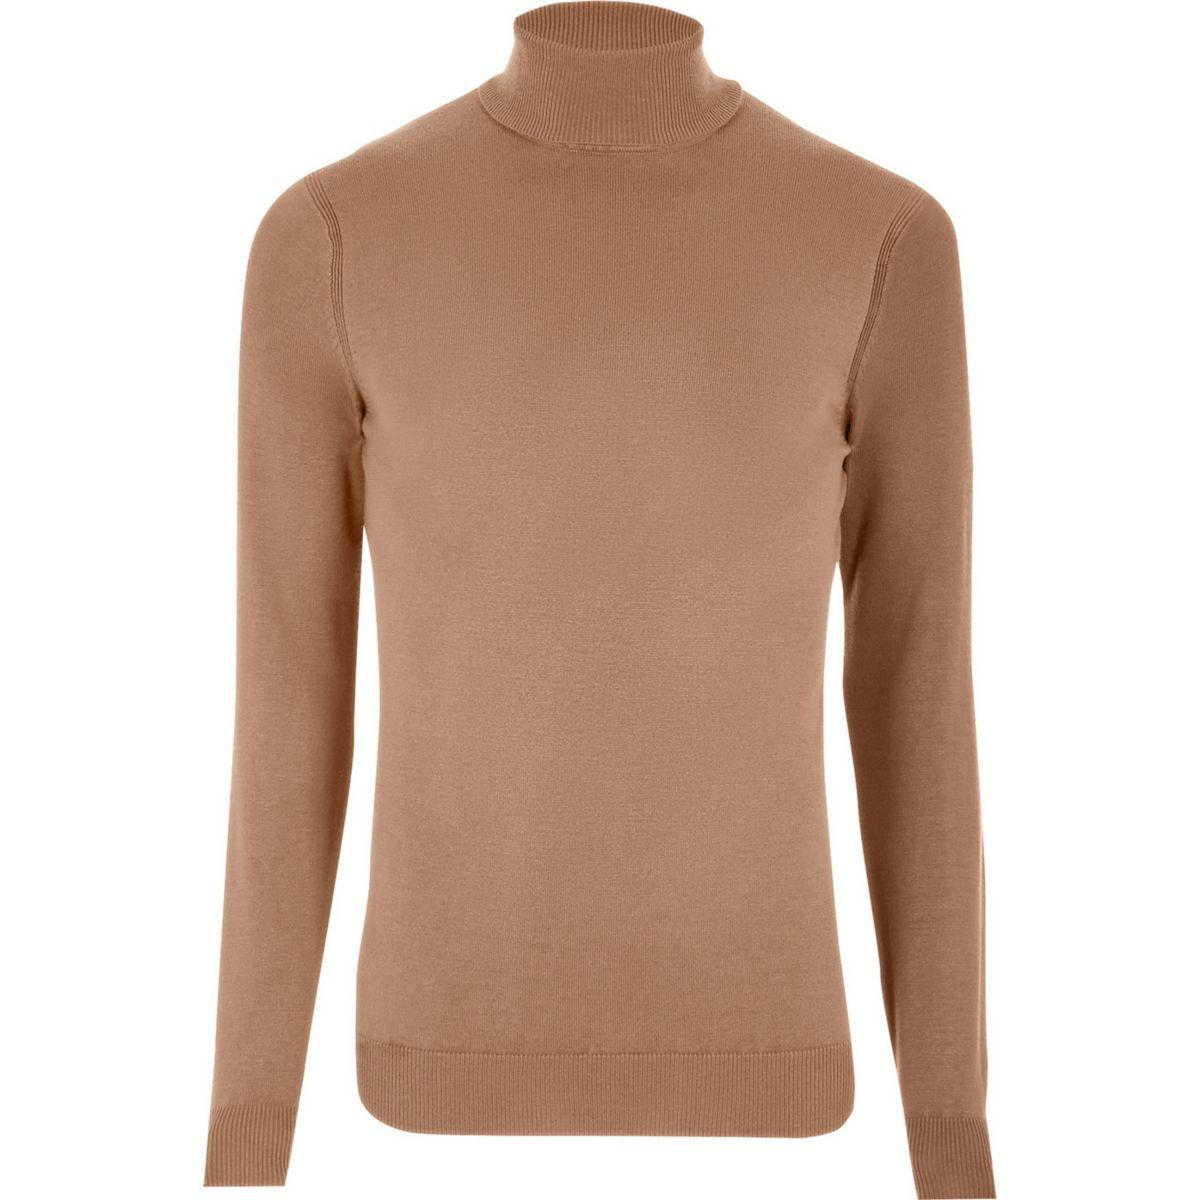 Camel roll neck long sleeve sweater